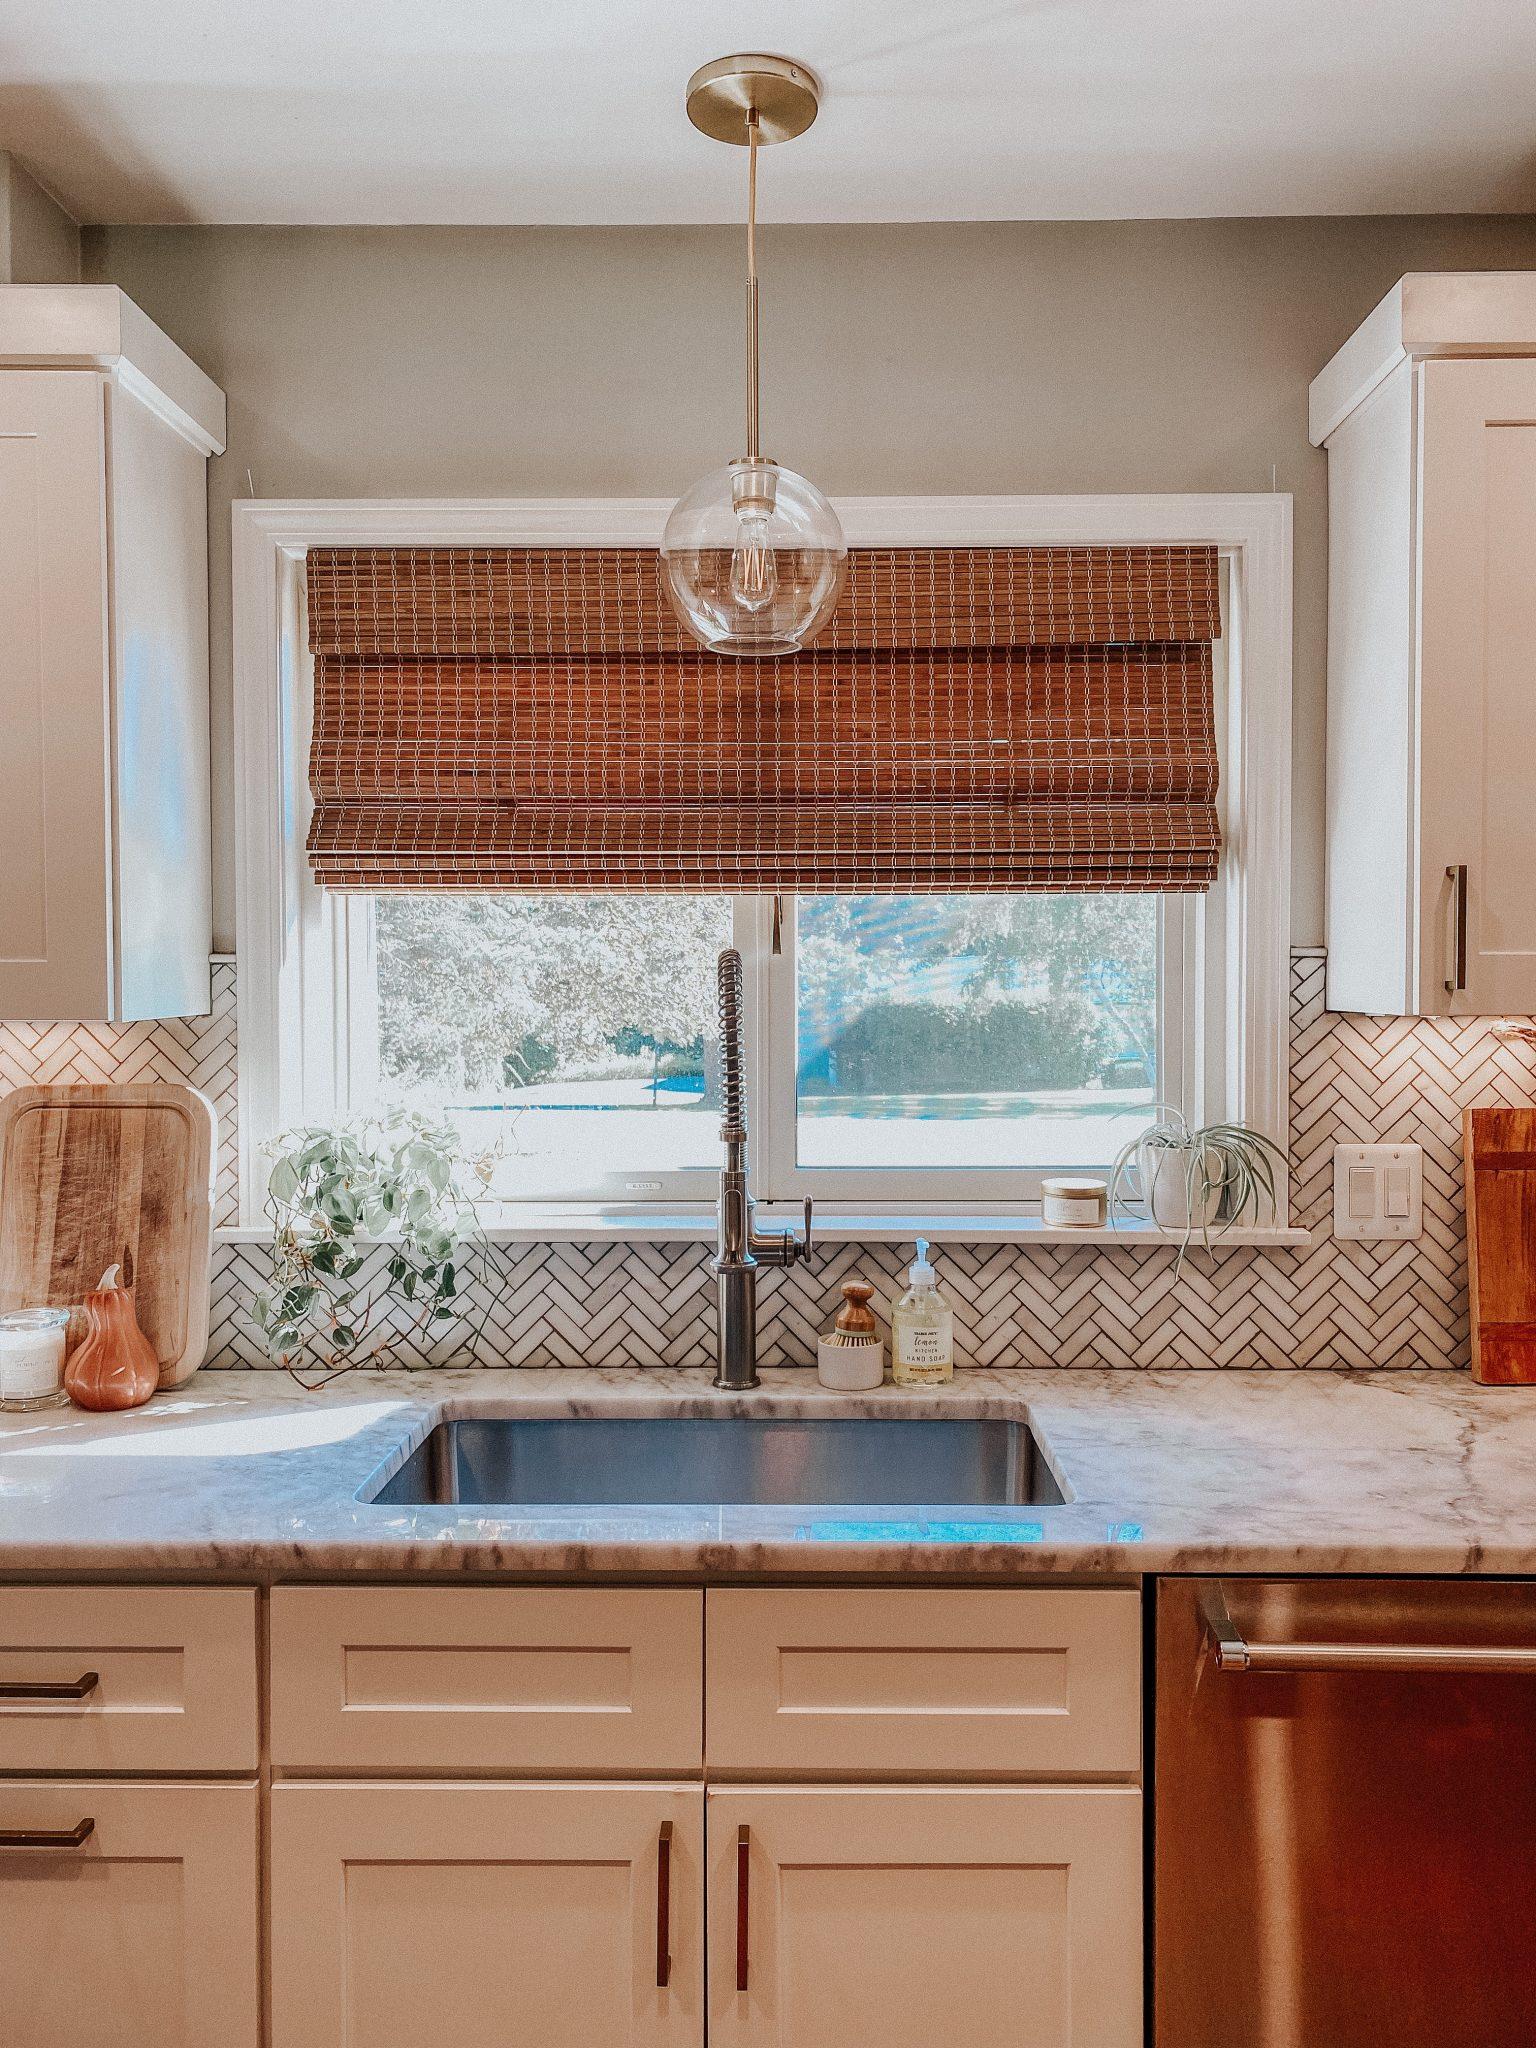 Easy ways to change up a room | Daily Splendor Home and Style Blog | kitchen pendant #kitchendesign #kitchendecor #modernorganic #tranistiondesign #bambooshade #whitecabinets #globependant